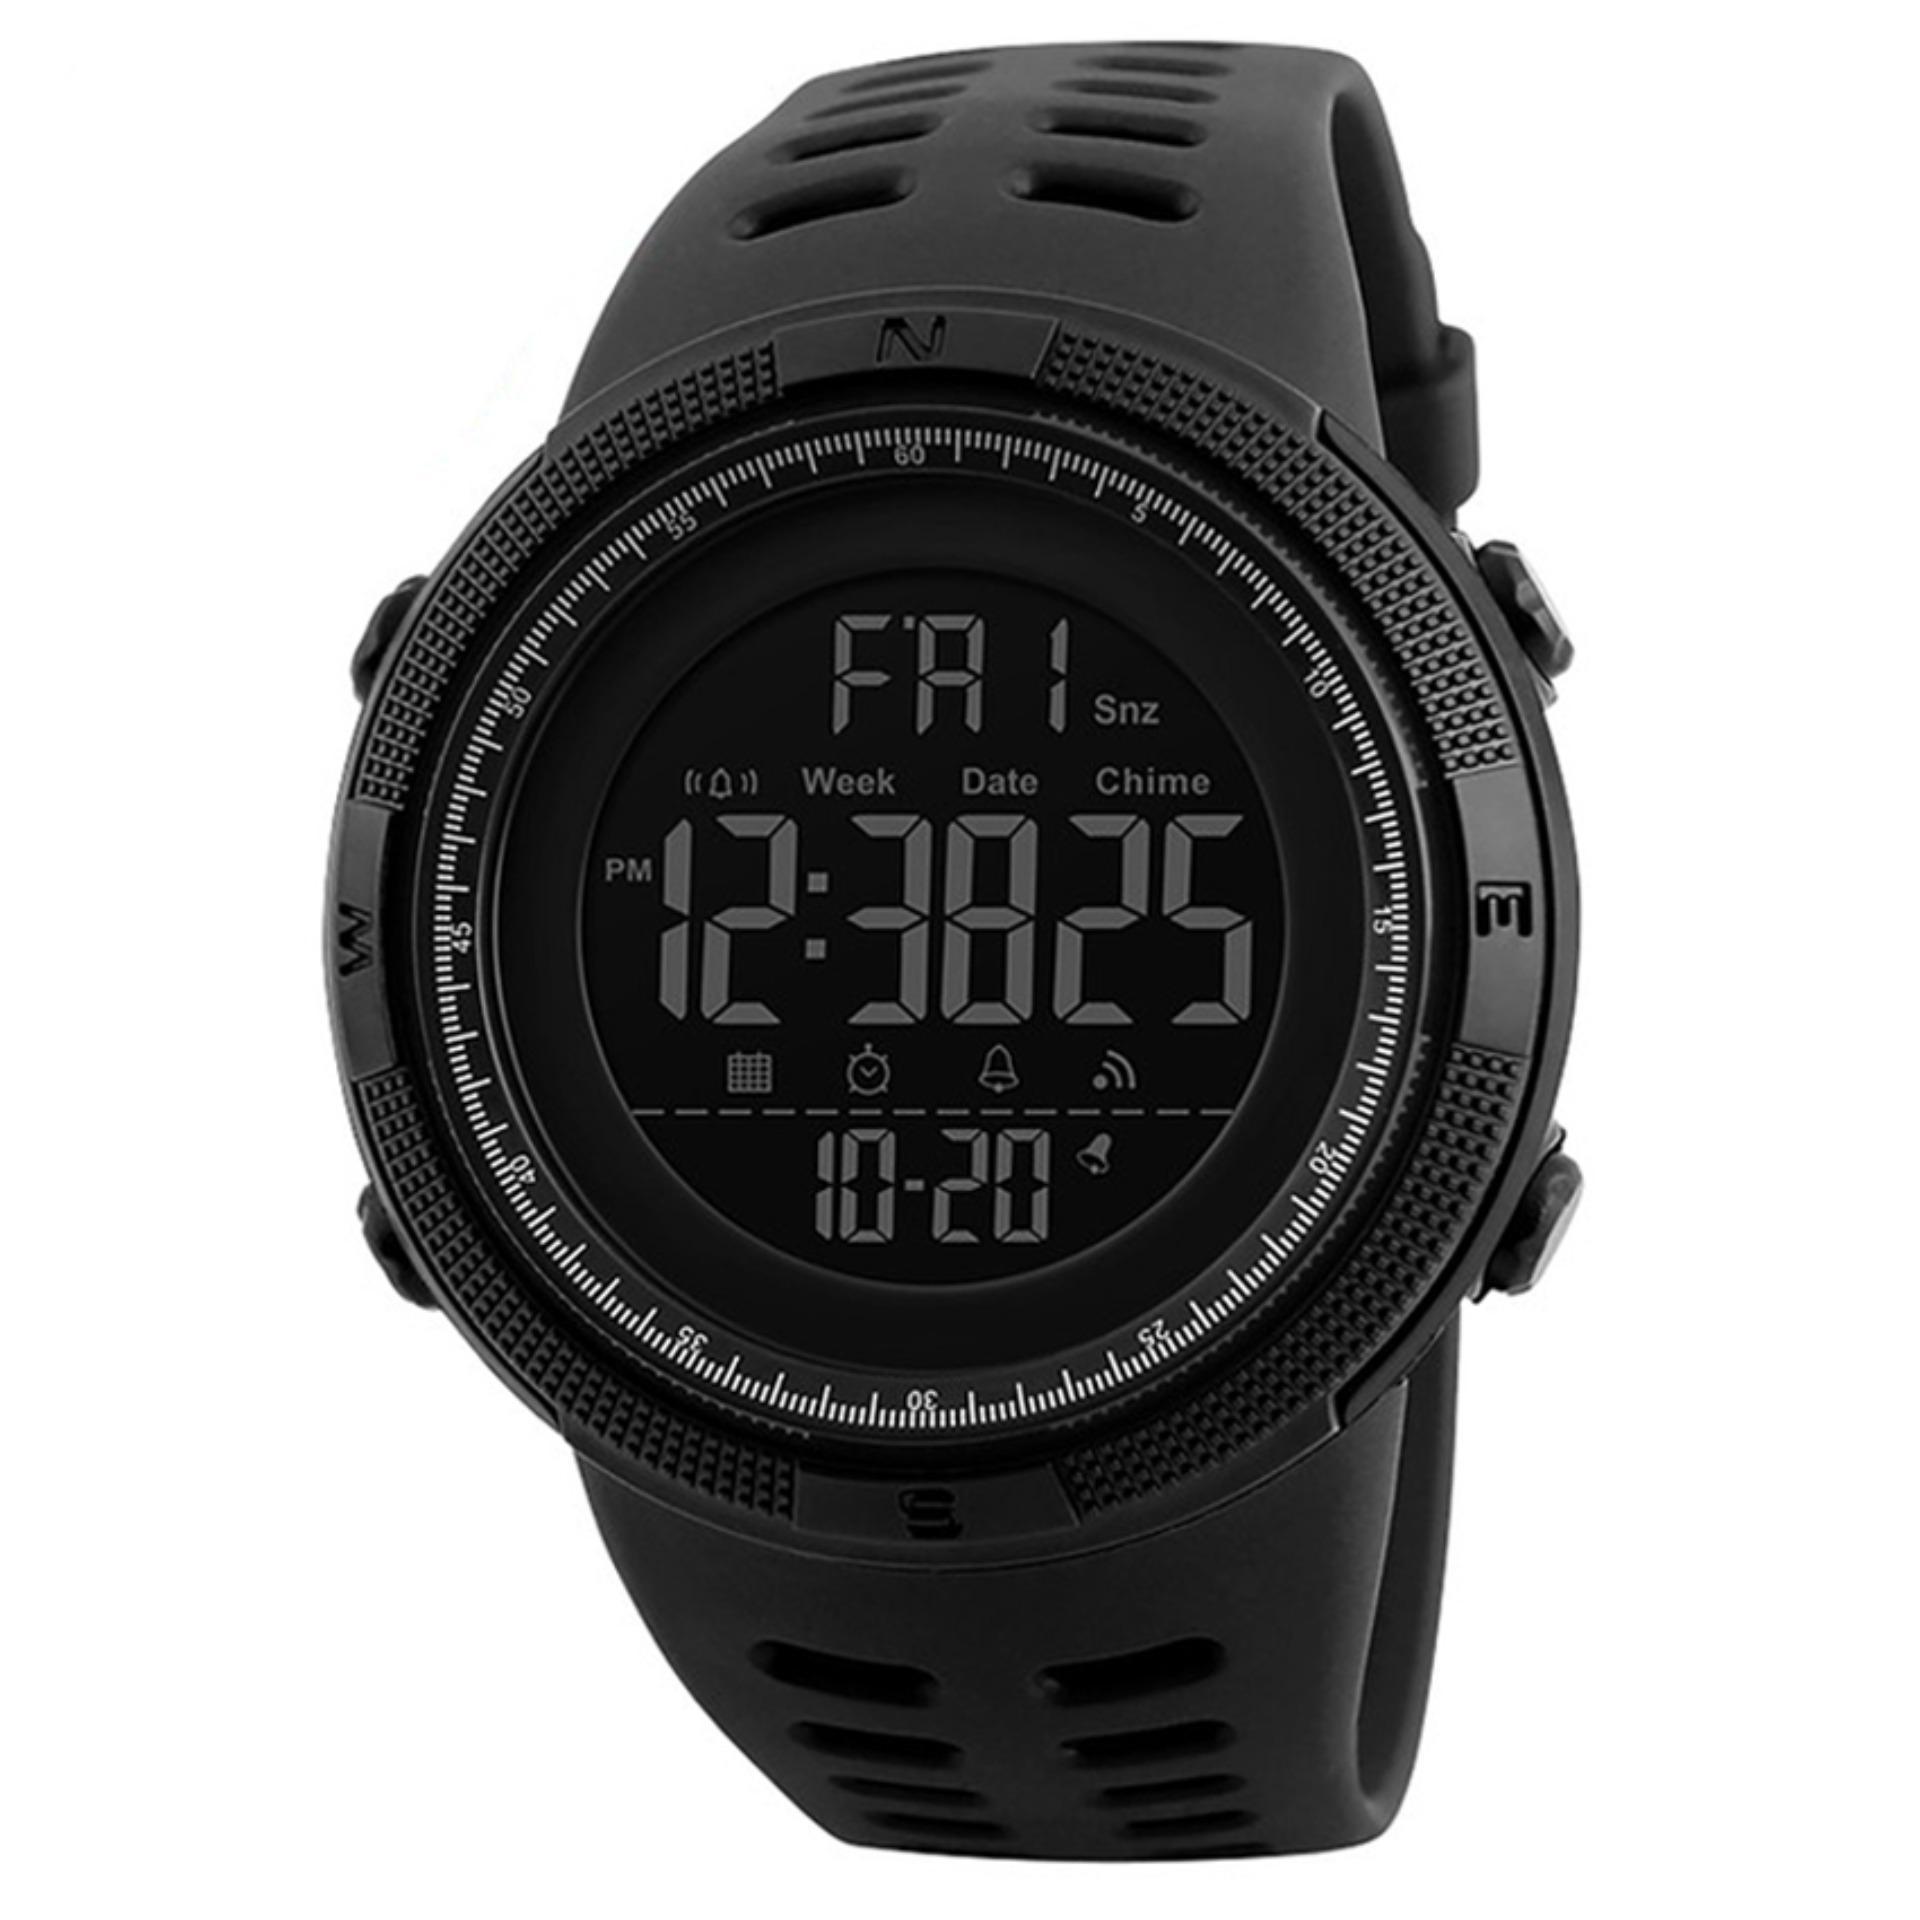 [100% Genuine]New SKMEI Men's Sports Watch Chronograph Alarm Clock Digital Watch 50M